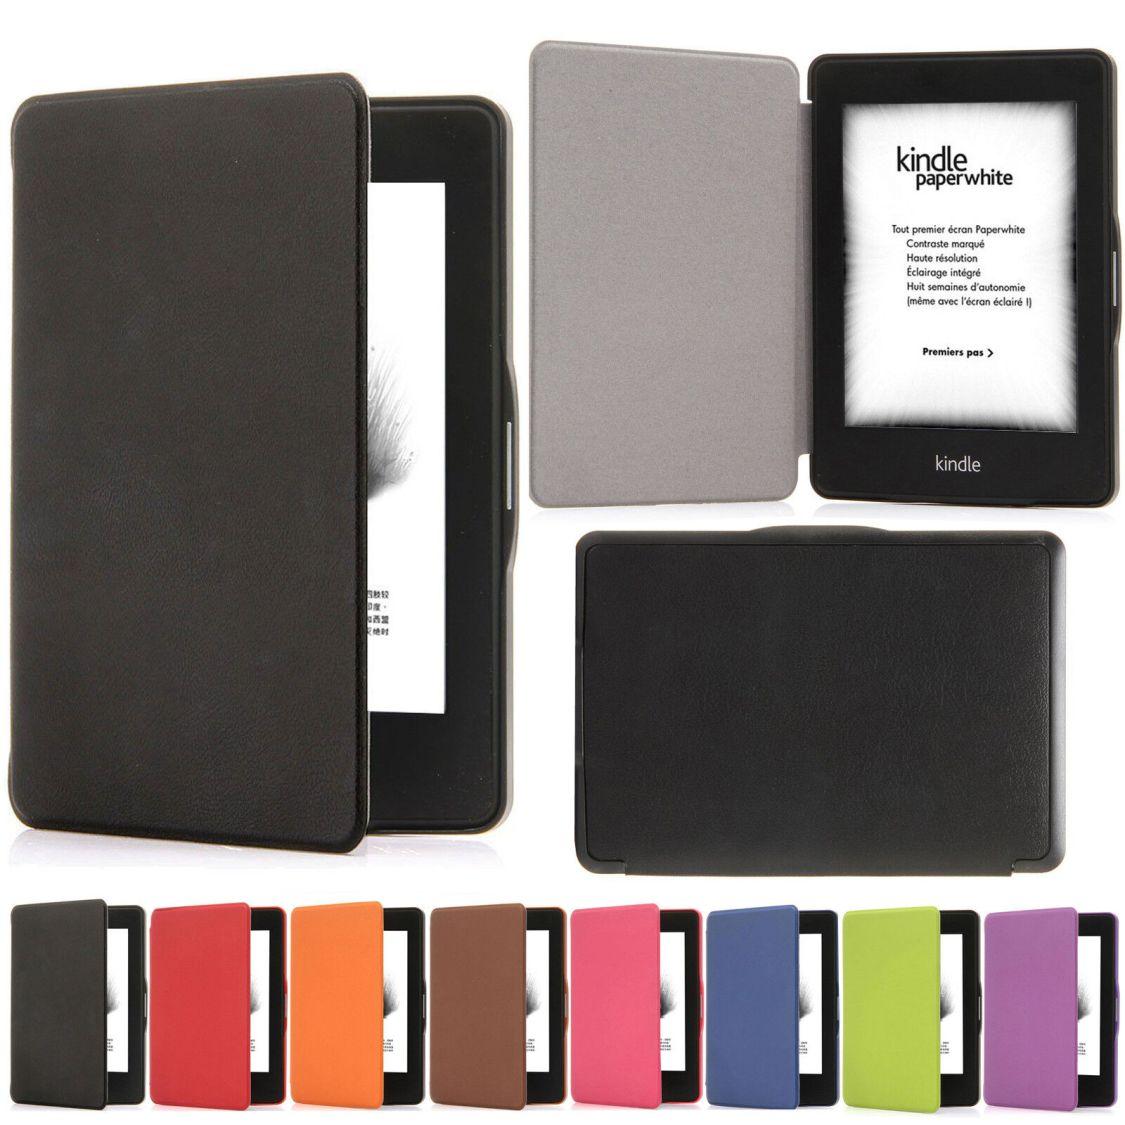 Schutz Hülle Amazon Kindle Paperwhite (7.Generation) Tasche Etui Cover Case 8F